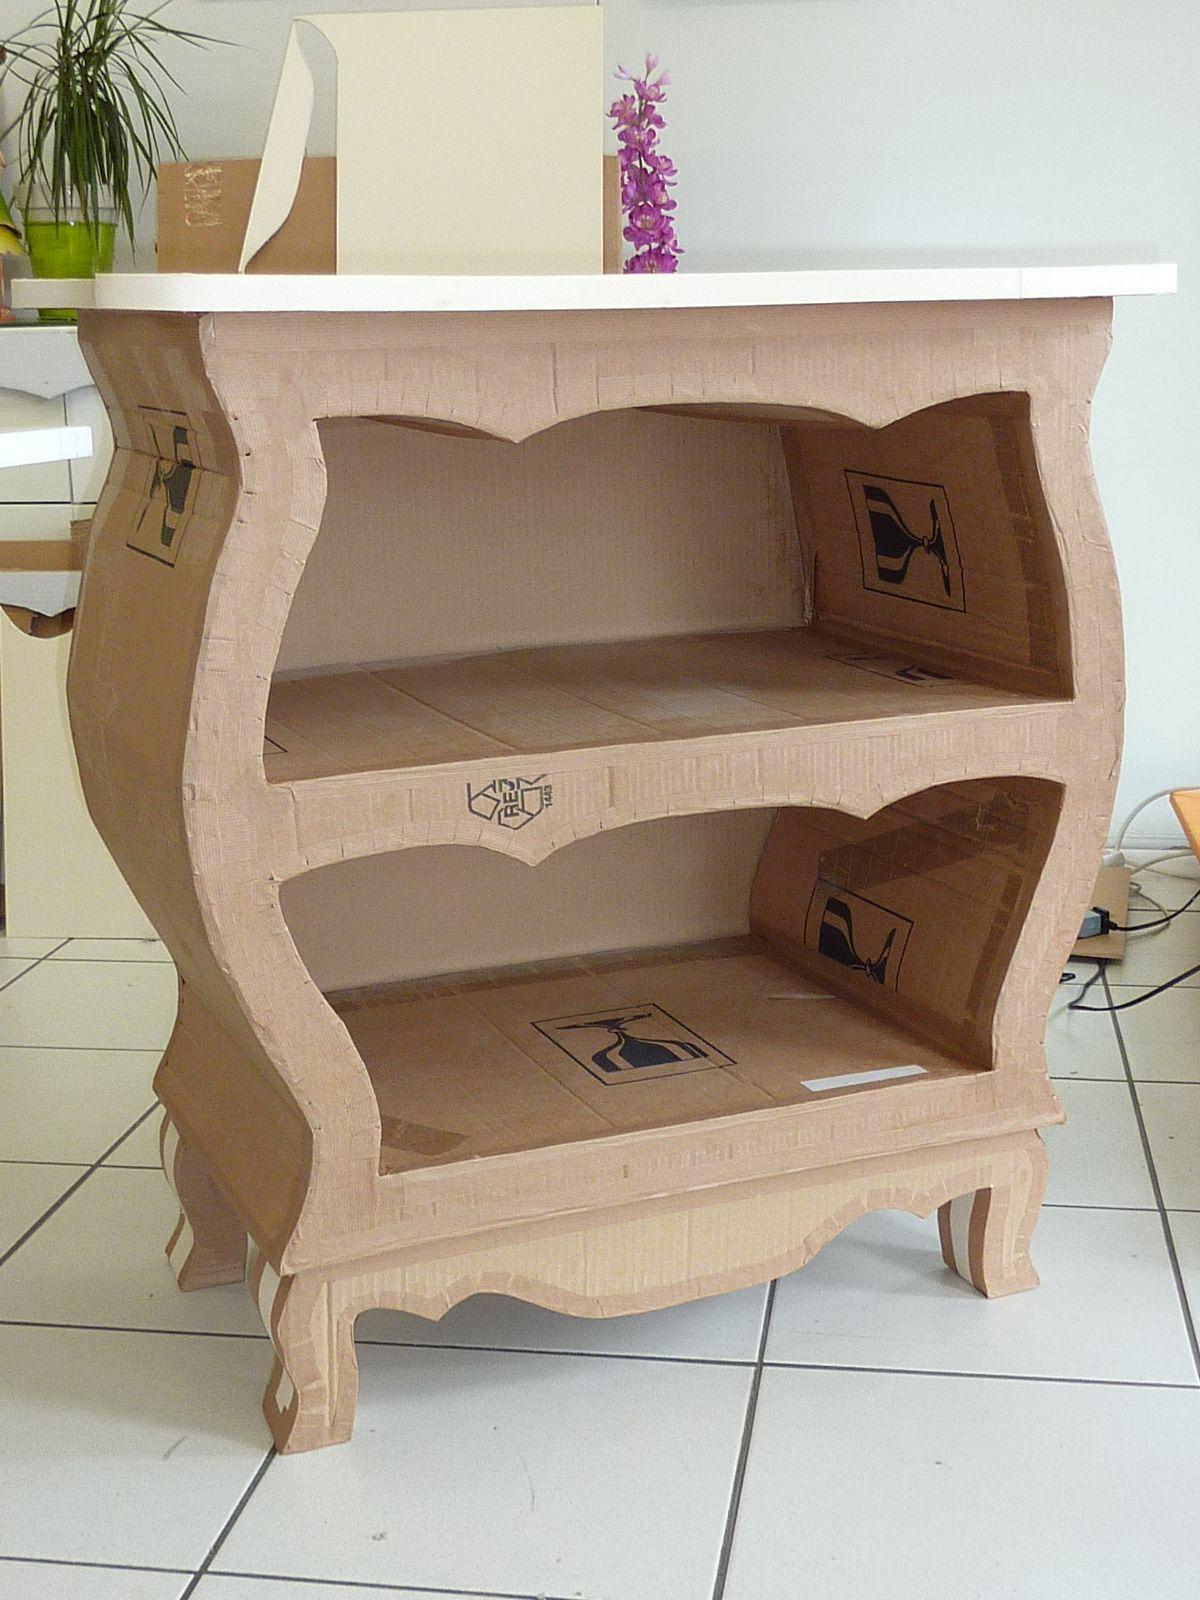 Made Of Cardboard From L Atelier Cadre Et Deco Commode Realisee Par Syvette En Stage Www Cadreetdeco En 2020 Mobilier En Carton Meuble En Carton Meubles En Carton